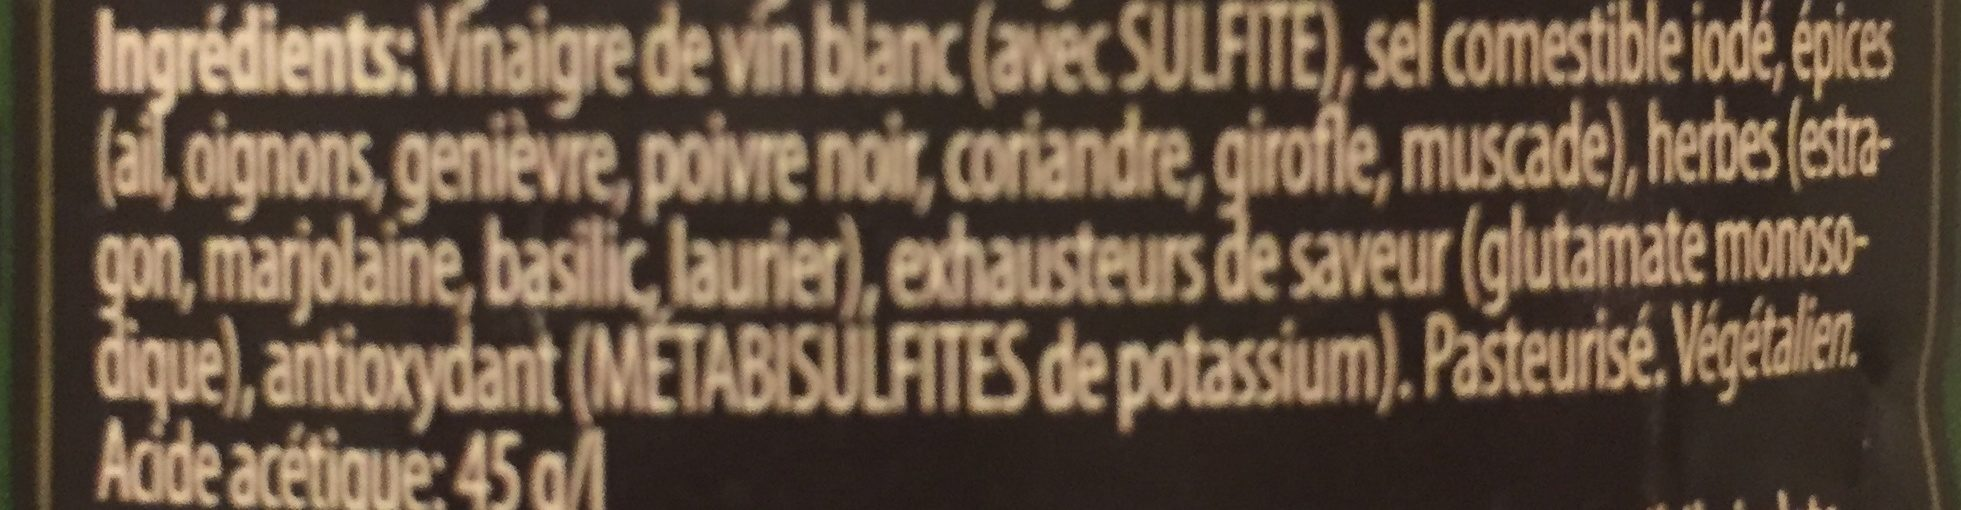 Kressi aux Herbes - Ingrédients